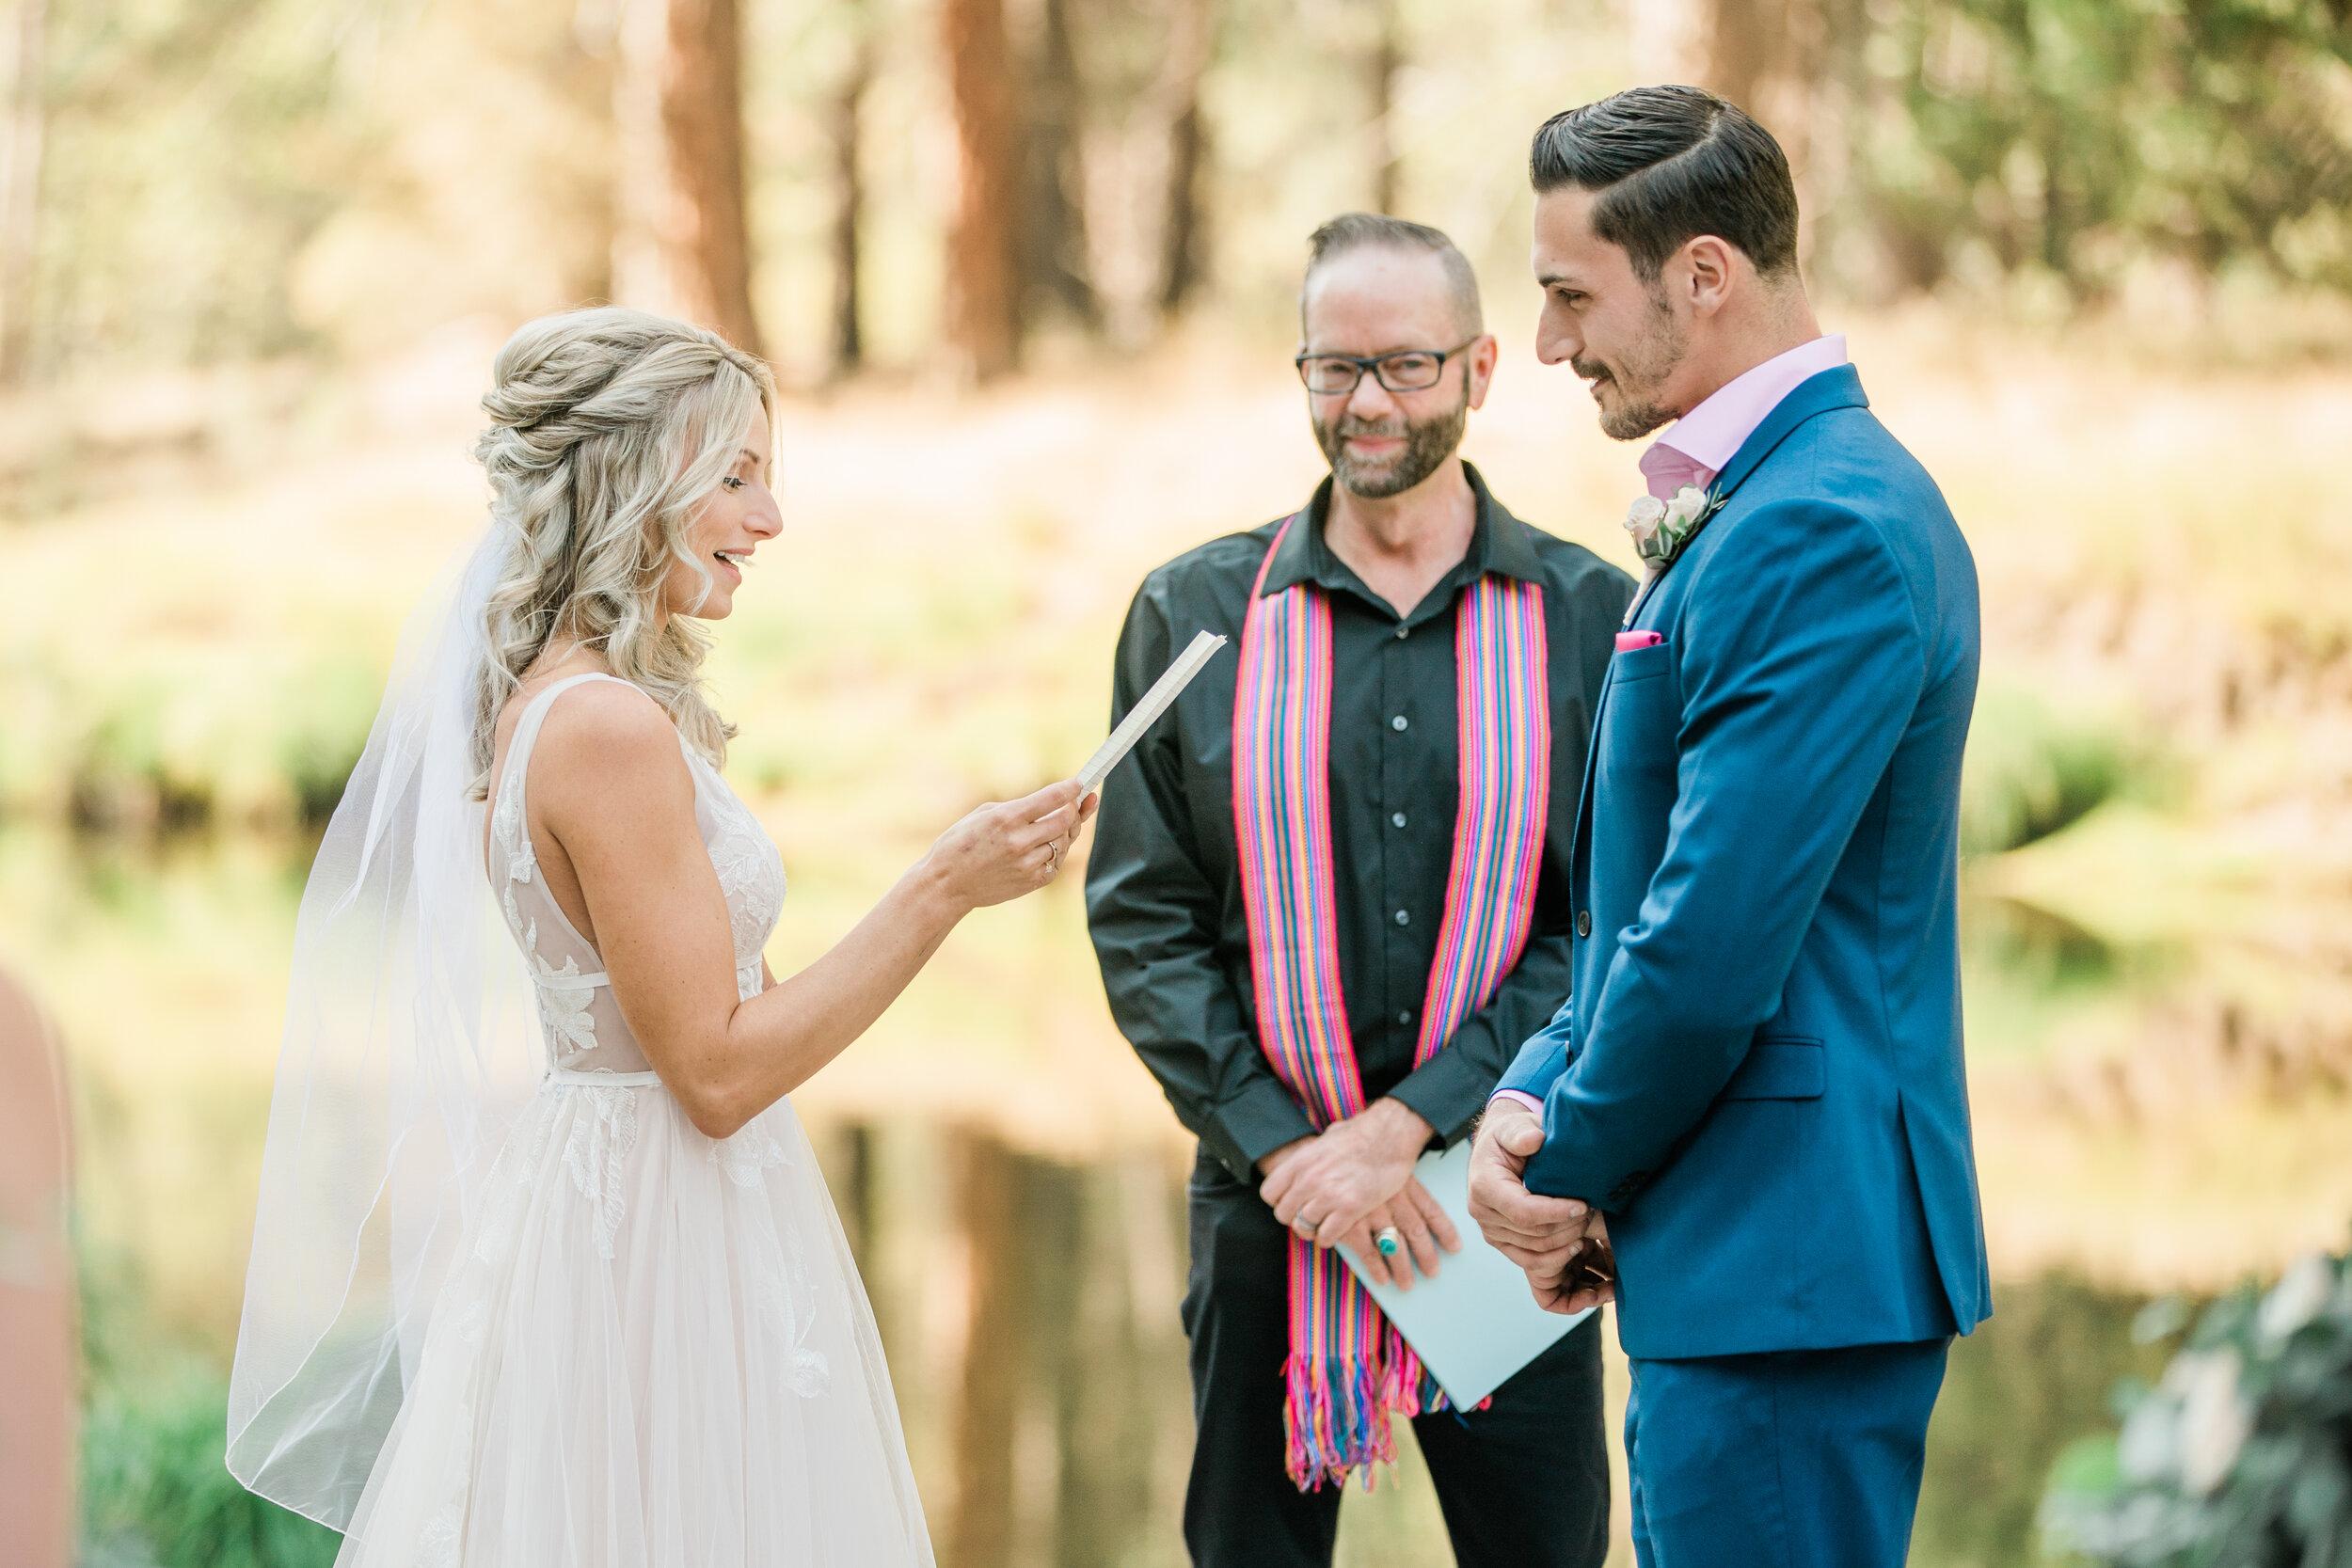 Leanne and Joe - Married - Sneak Peeks - Lauren Alisse Photography-18.jpg